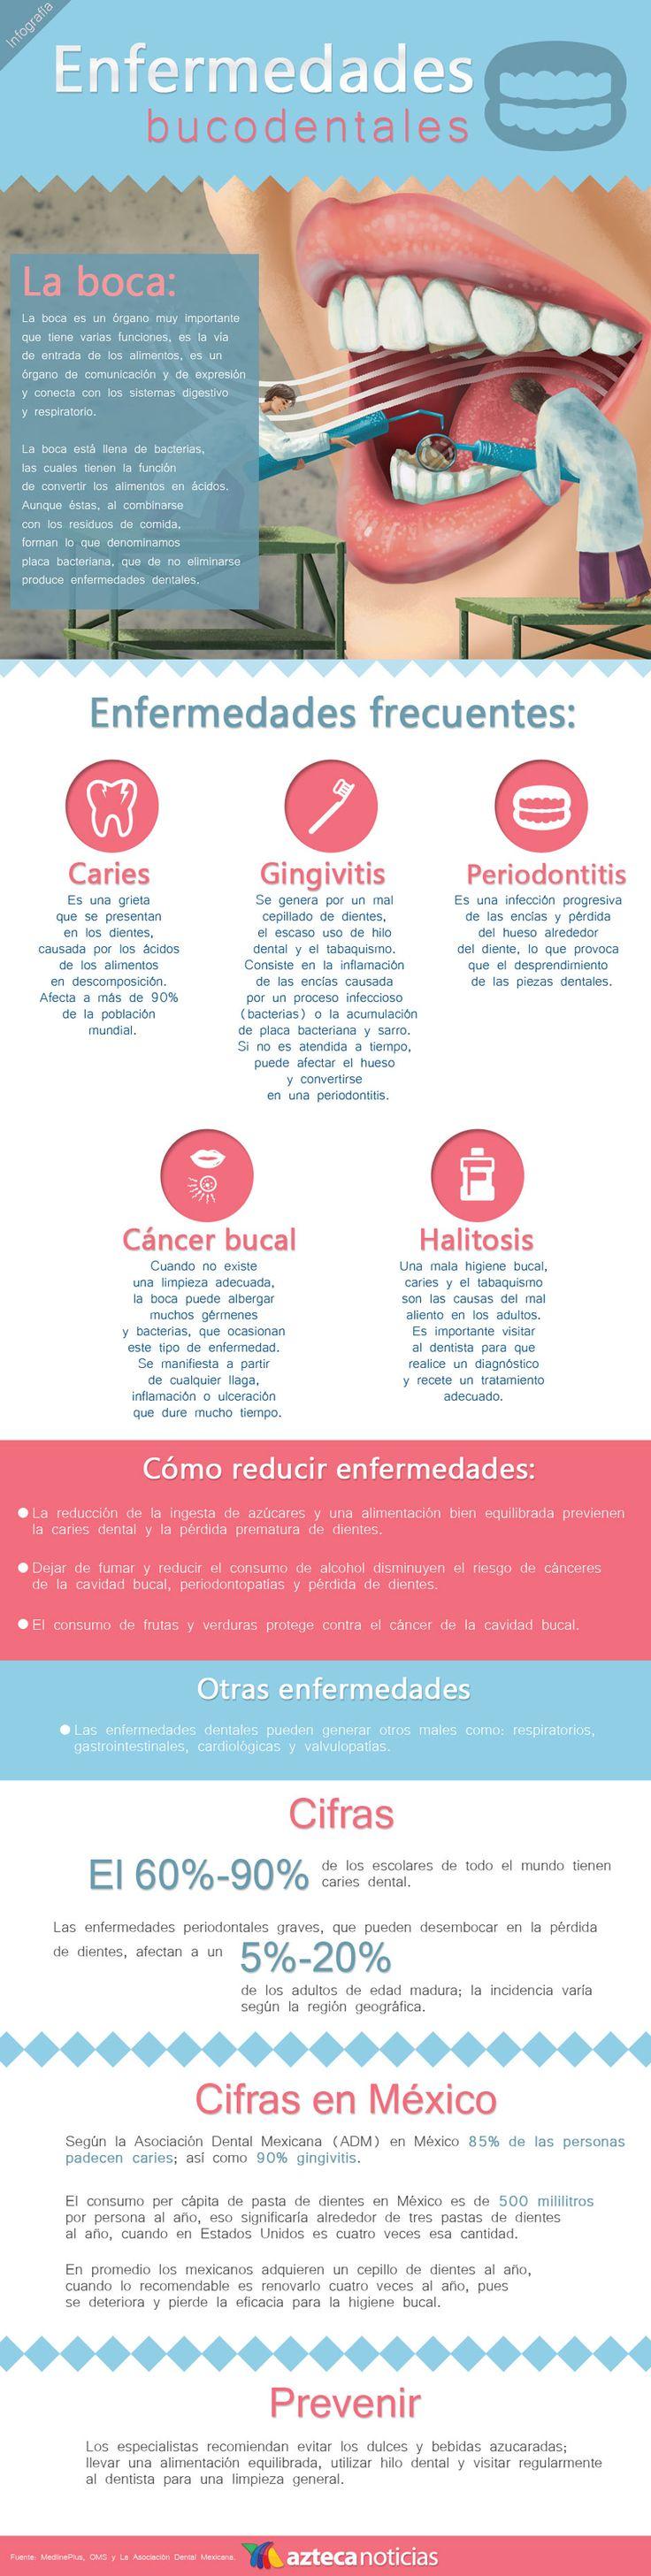 #Infografia Enfermedades bucodentales